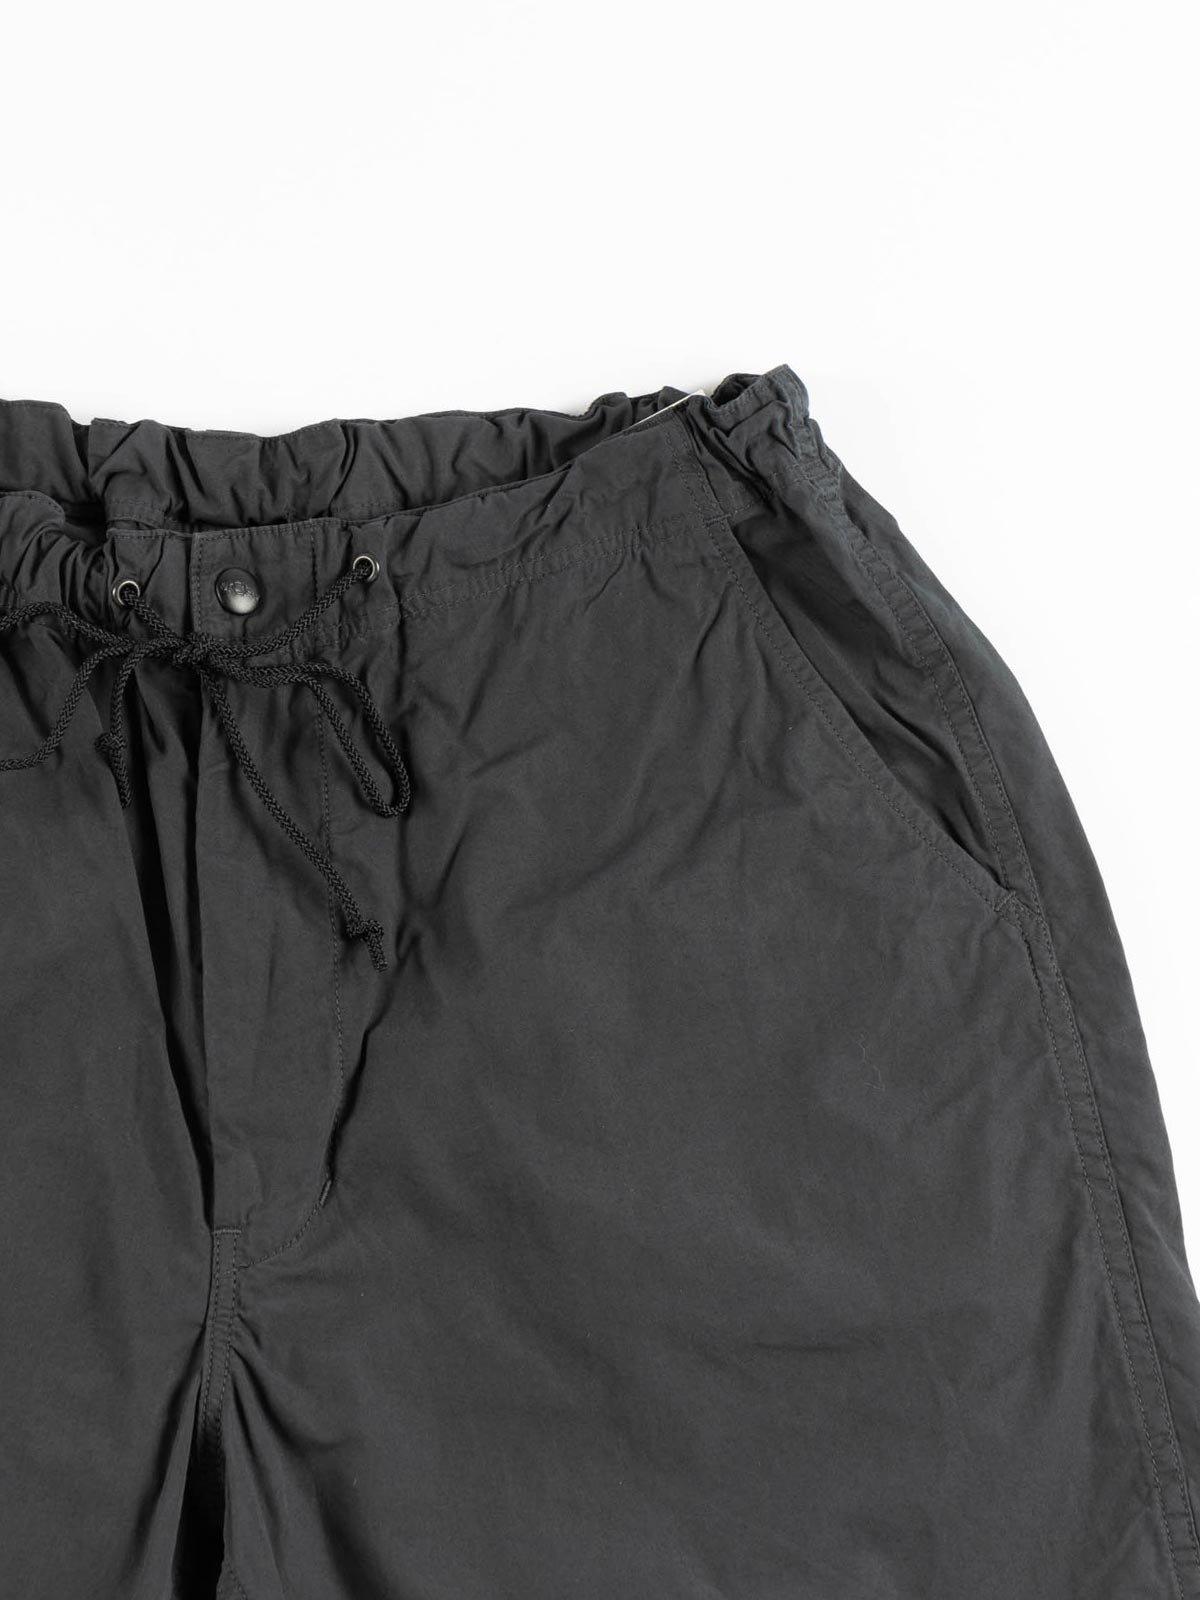 NEW YORKER SHORTS GRAY COTTON TYPEWRITER CLOTH - Image 2